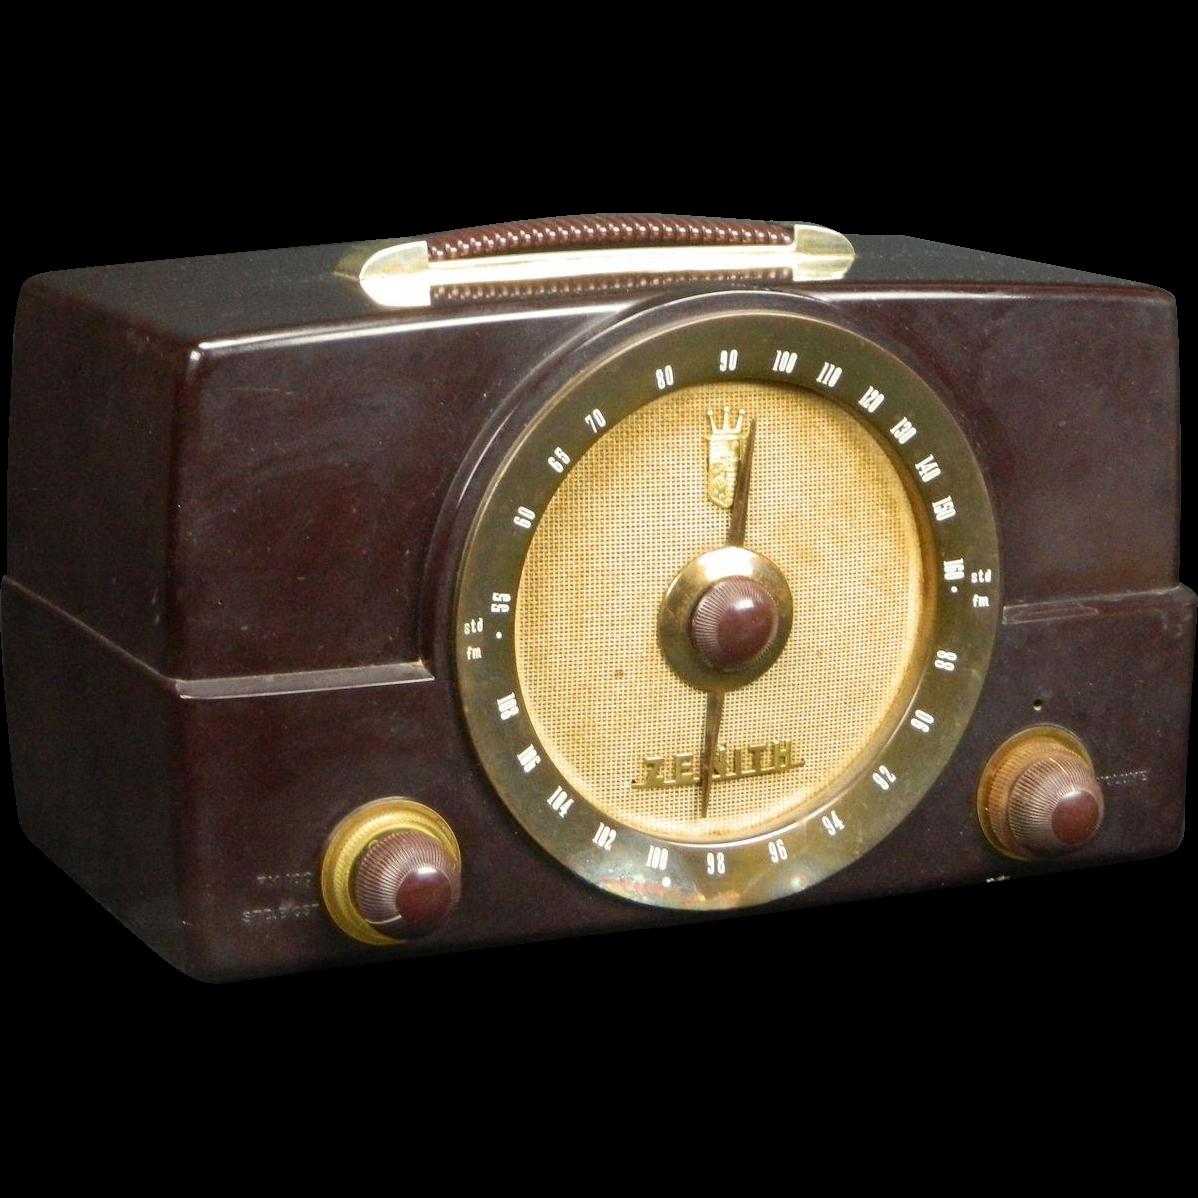 1950 Zenith Am Fm Radio Model H725 Www Rubylane Com Shop Extraordinary Radios Vintage Radio Antique Radio Old Radios